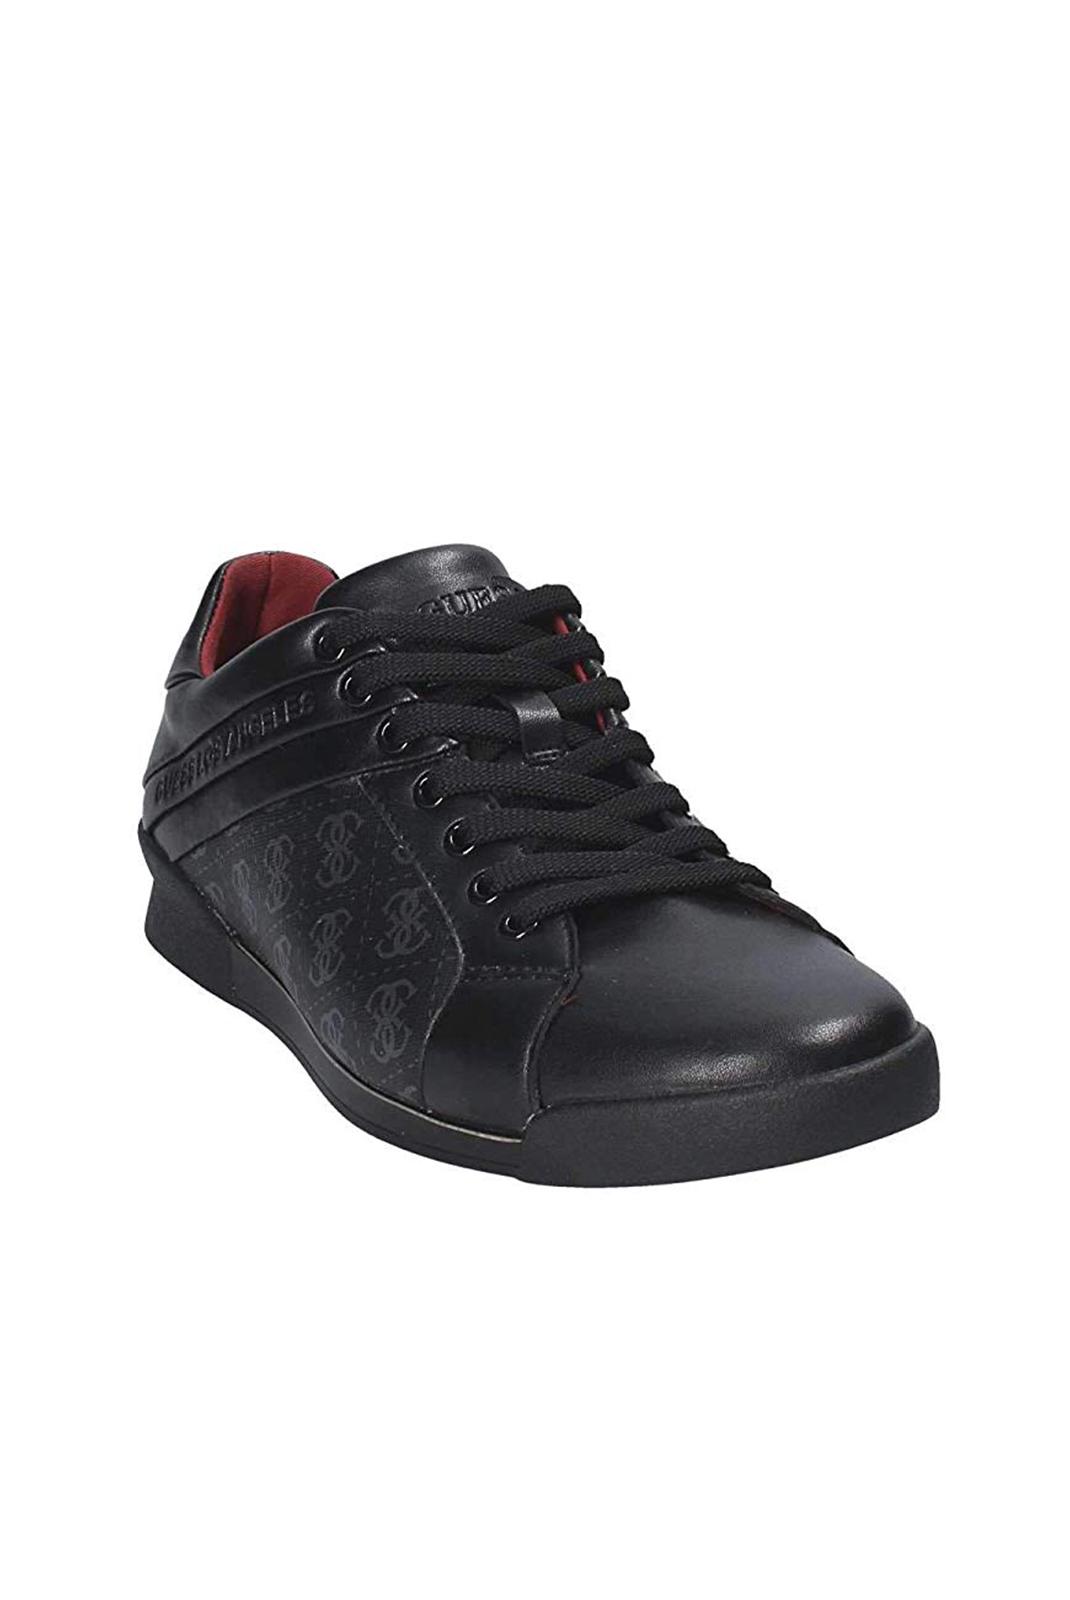 Baskets / Sport  Guess jeans FMNGR4 FAL12 BLACK/GREY